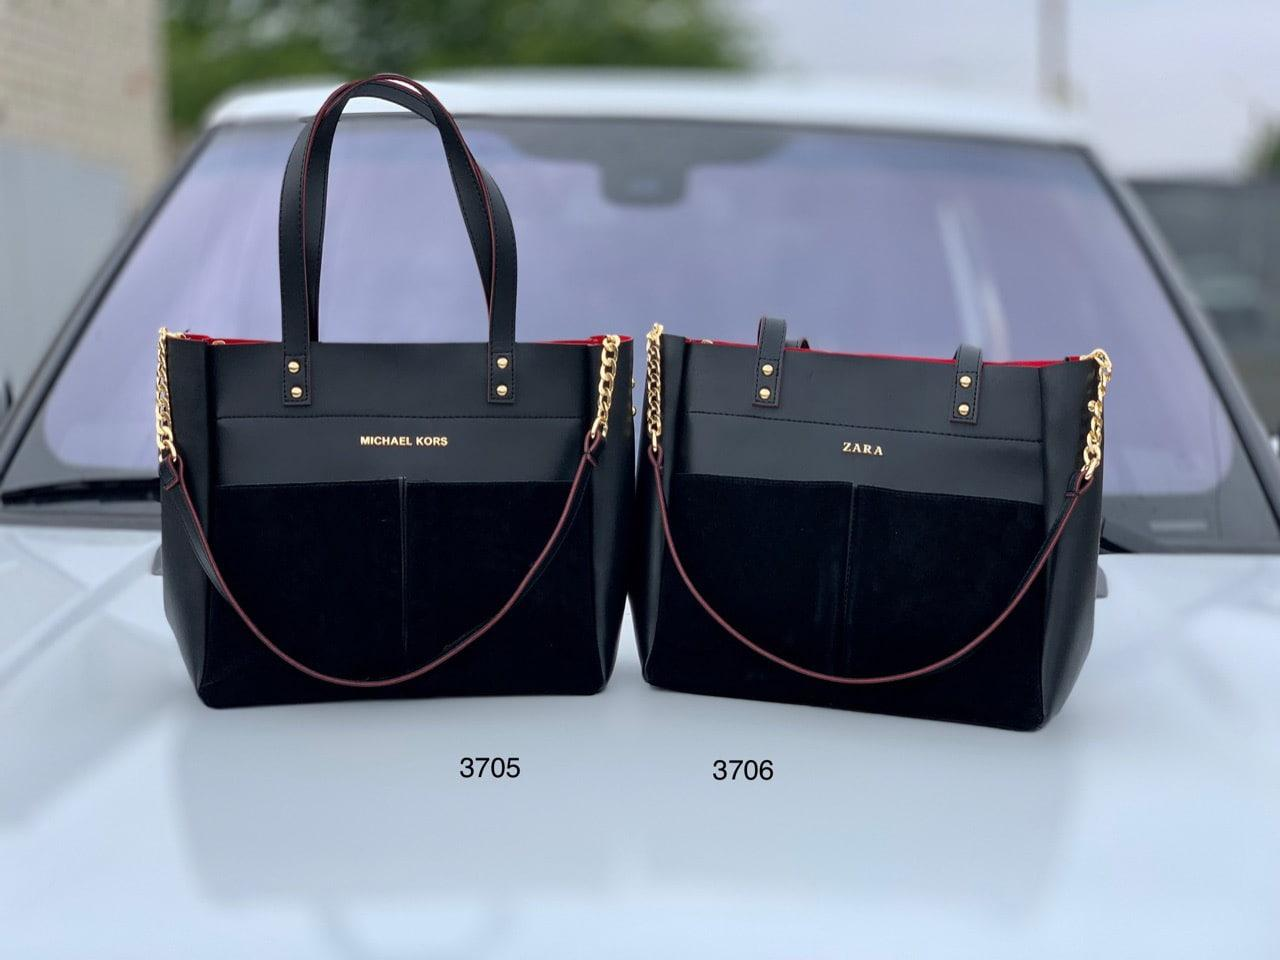 Женская сумочка Натуральная замша и эко-кожа (гладкая) Турция